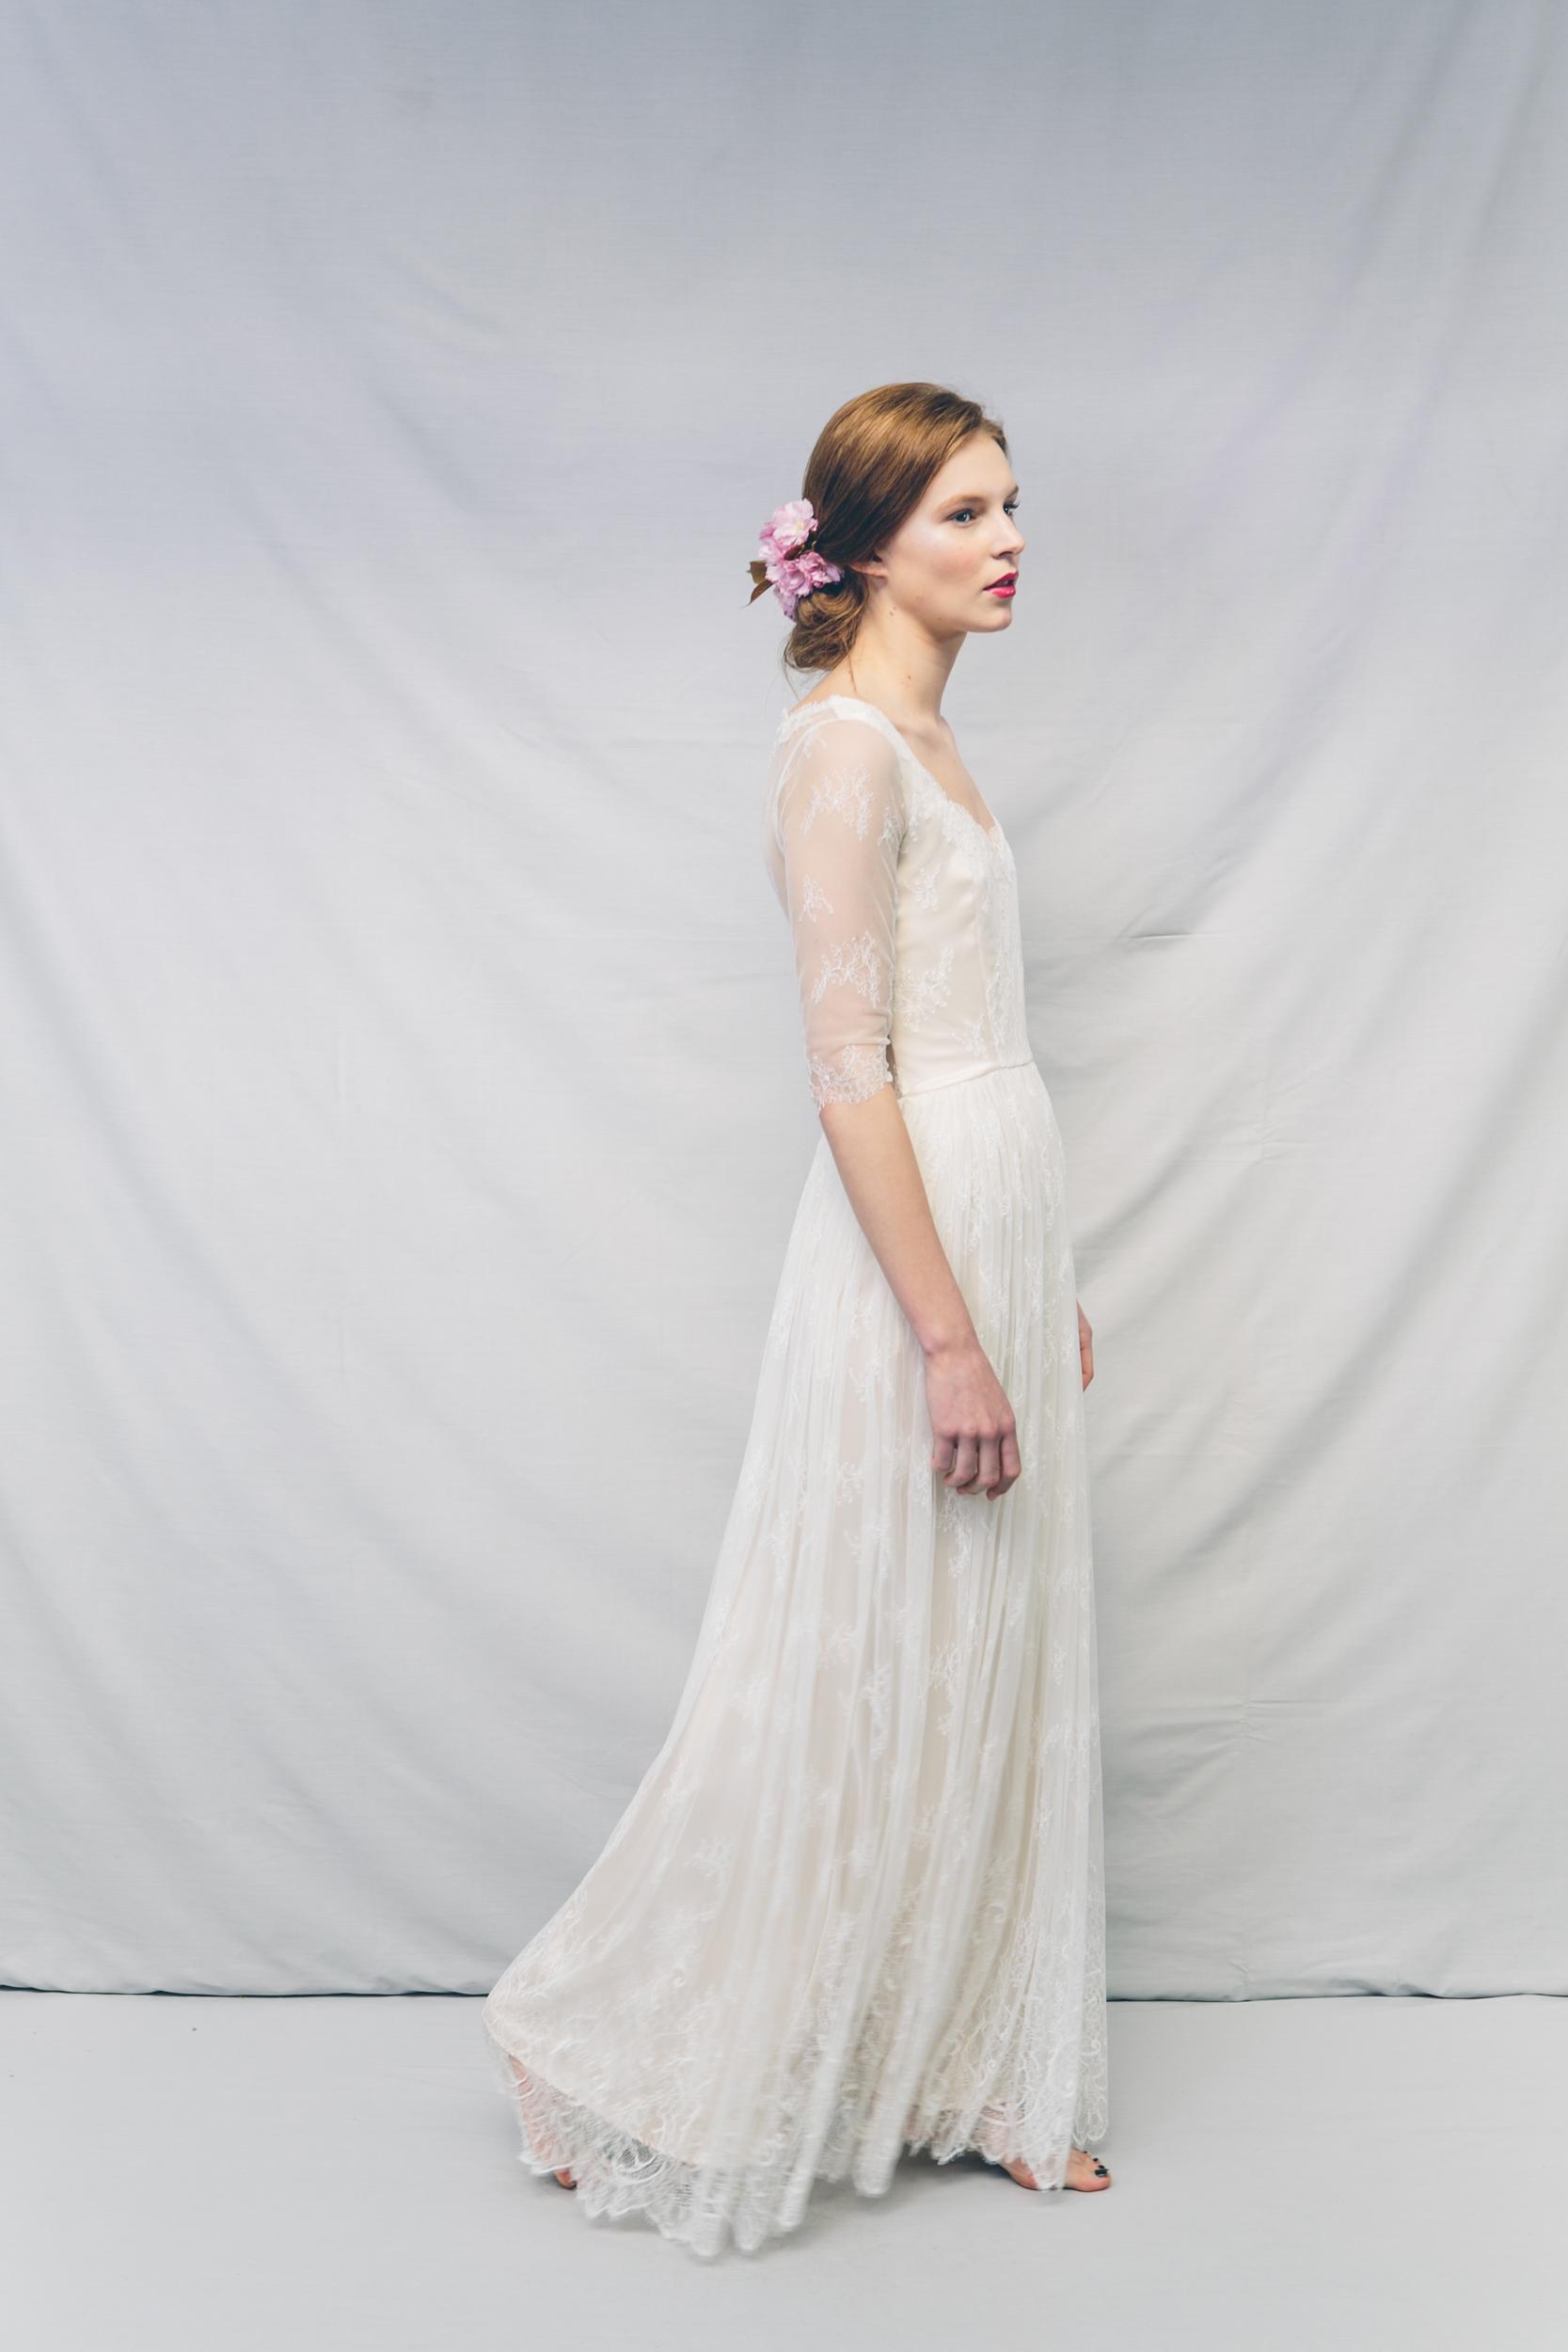 Kate-Beaumont-Wedding-Dresses-Sheffield-24.jpg